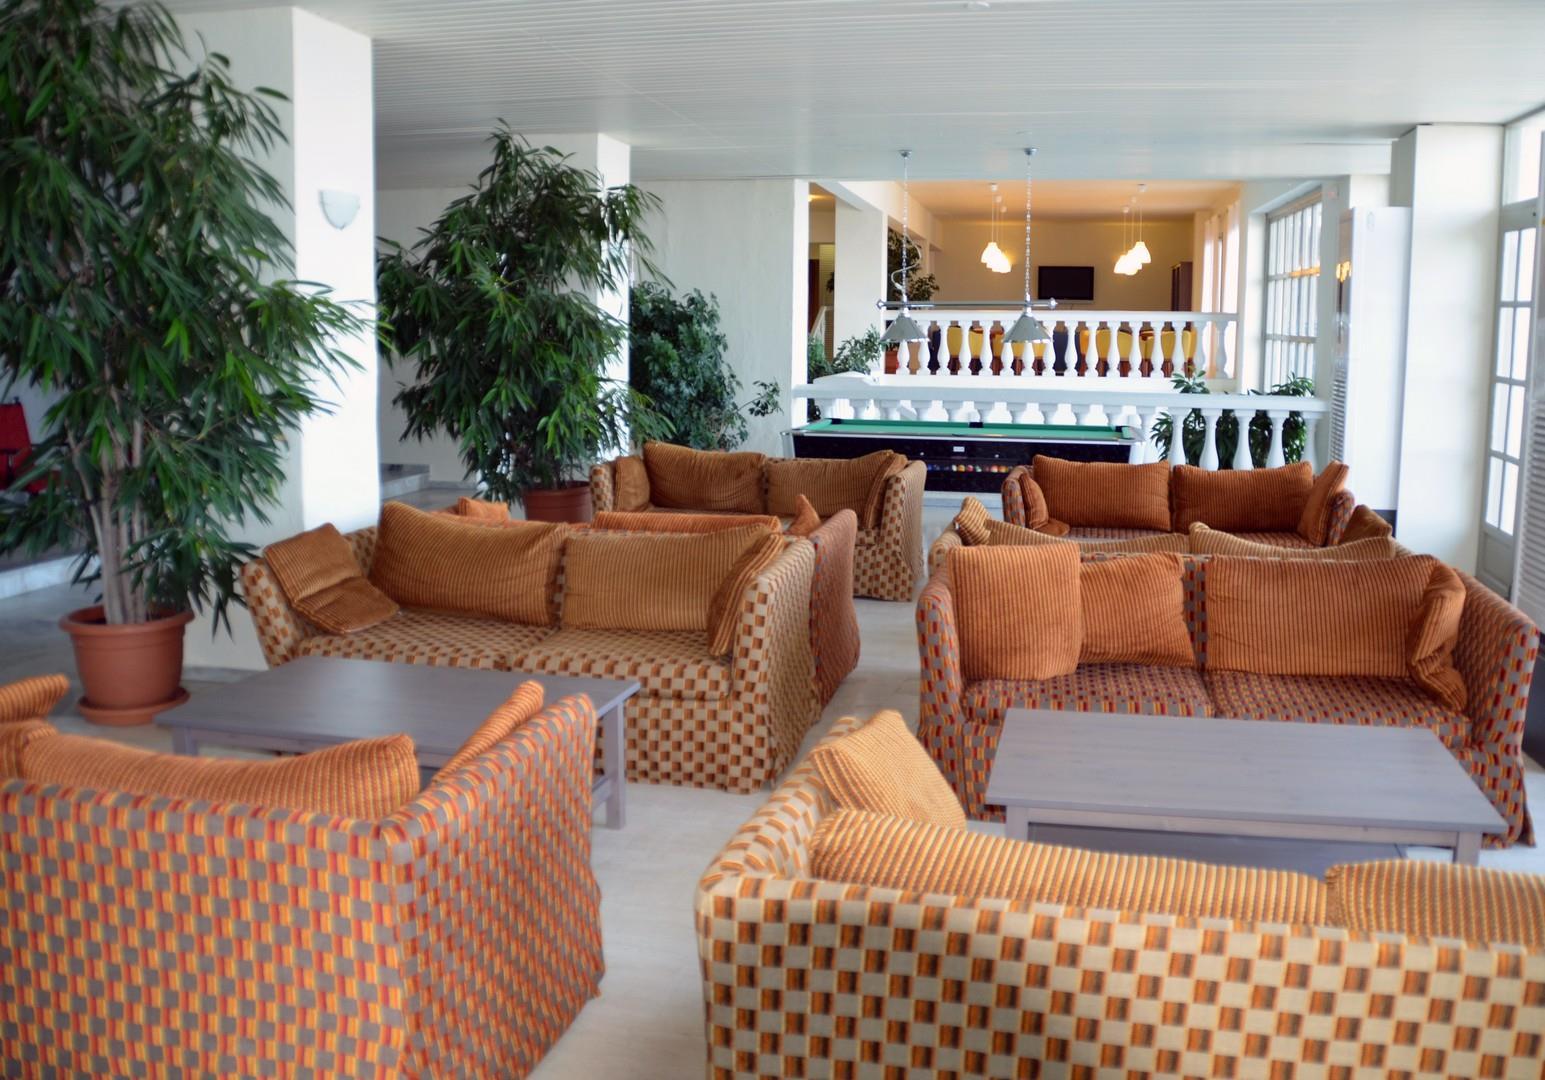 Belvedere hotel корфу